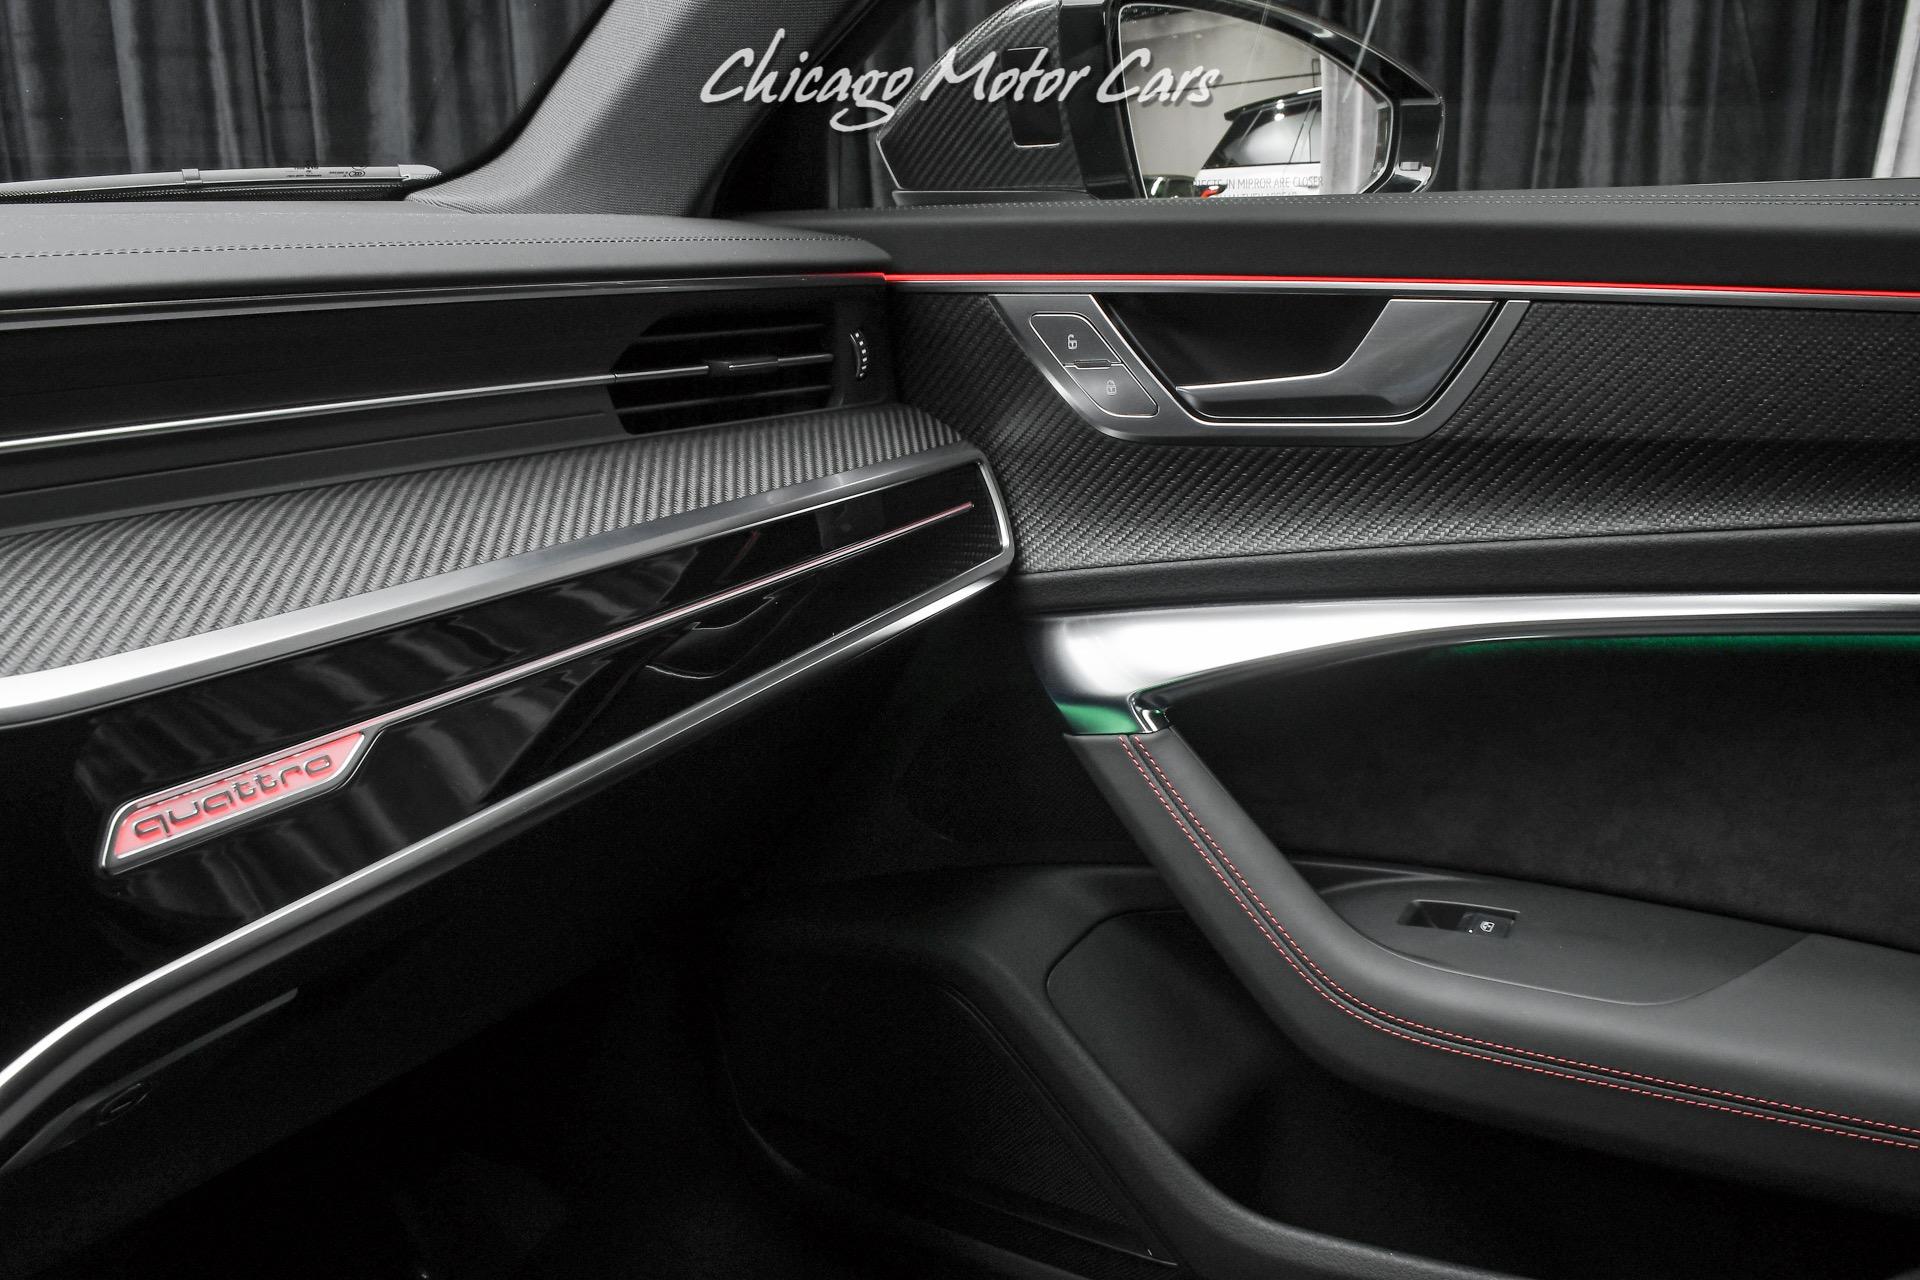 Used 2021 Audi RS6 4.0T Quattro Avant Hatchback LOADED w ...